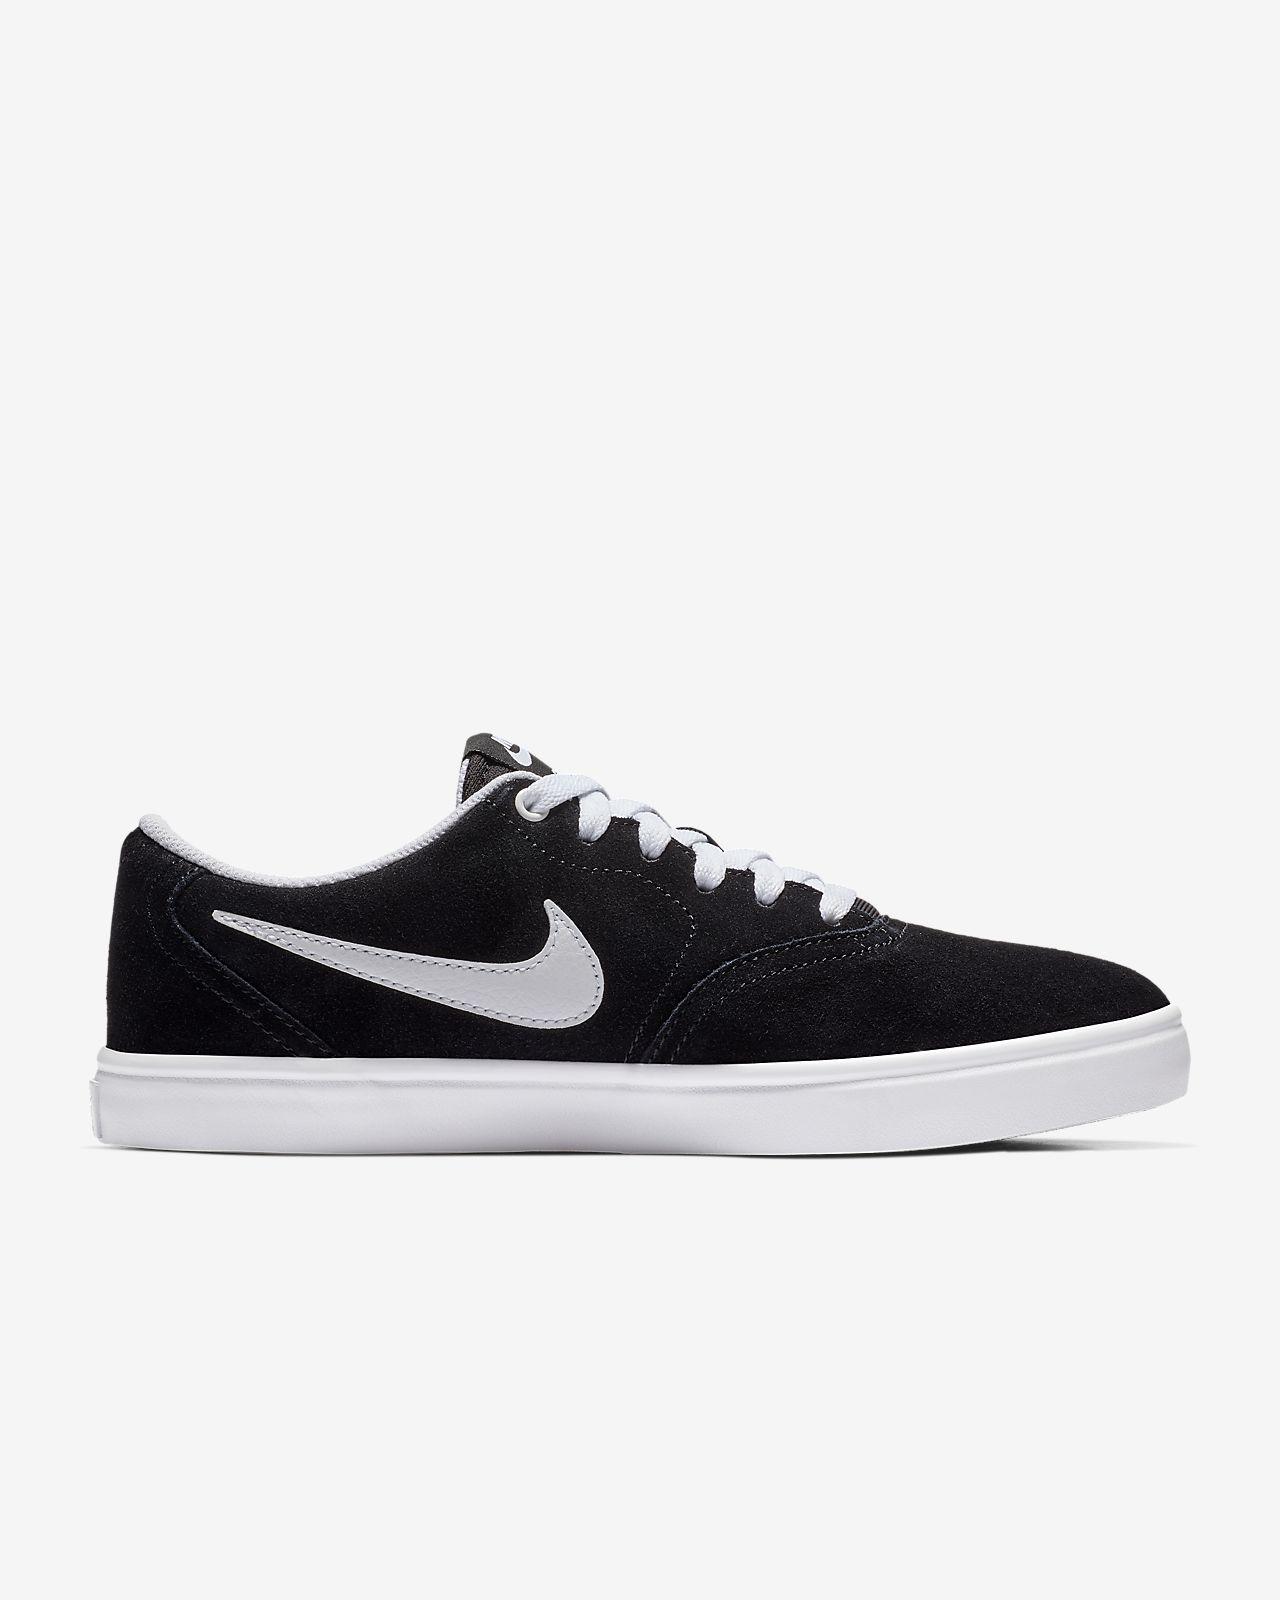 771ad90f436e Nike SB Check Solarsoft Women s Skate Shoe. Nike.com DK